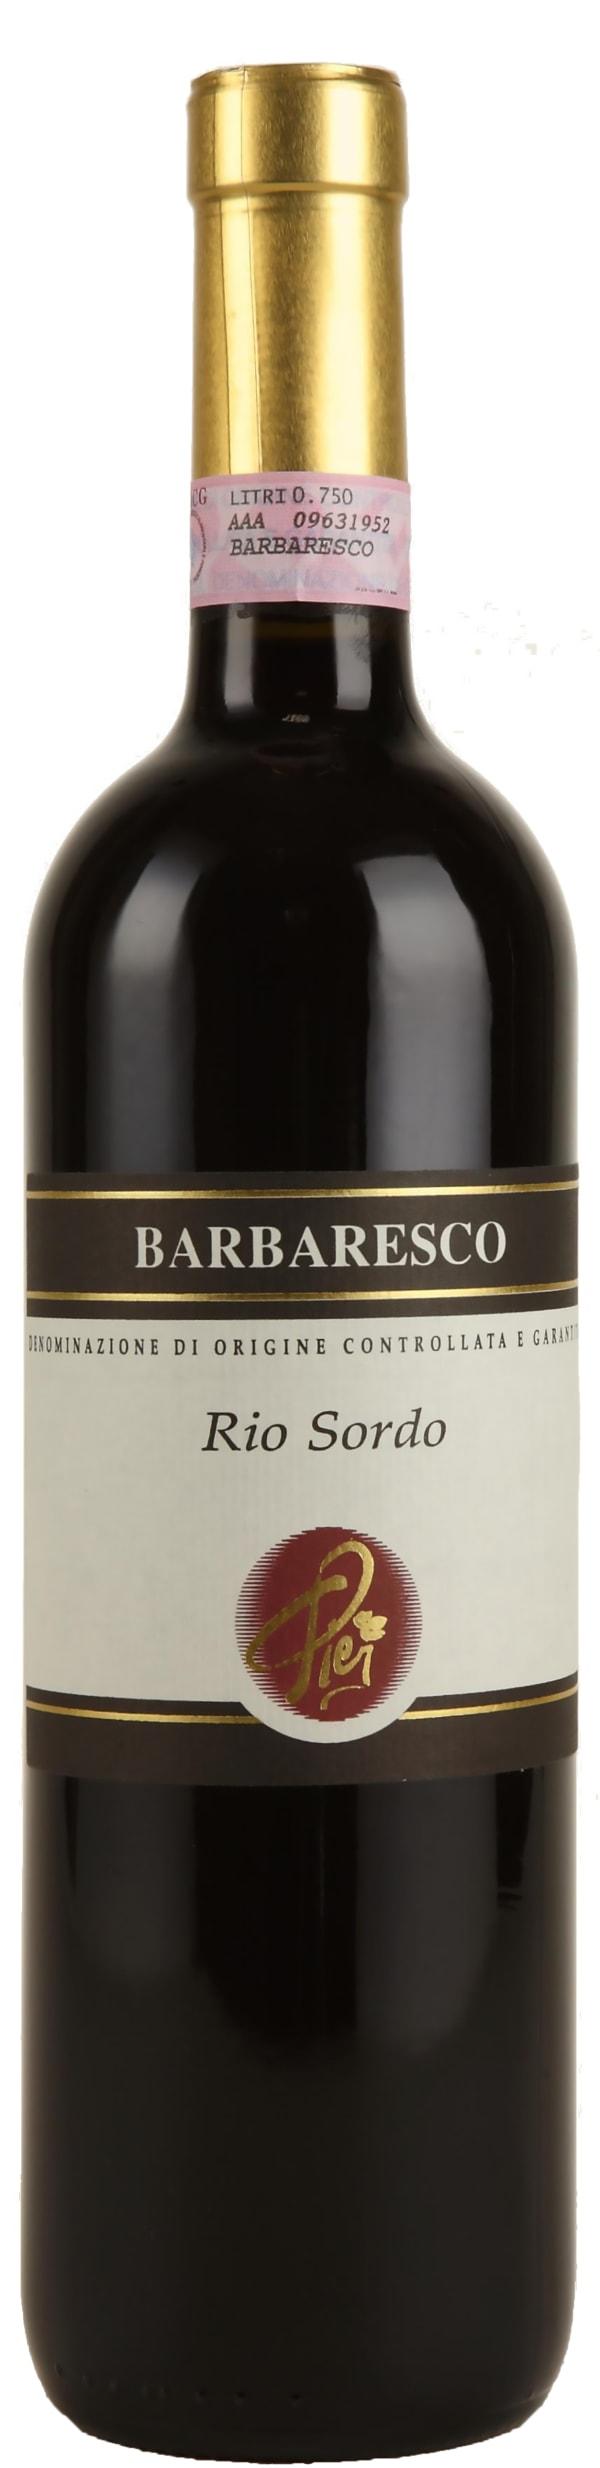 Pier Rio Sordo Barbaresco 2011